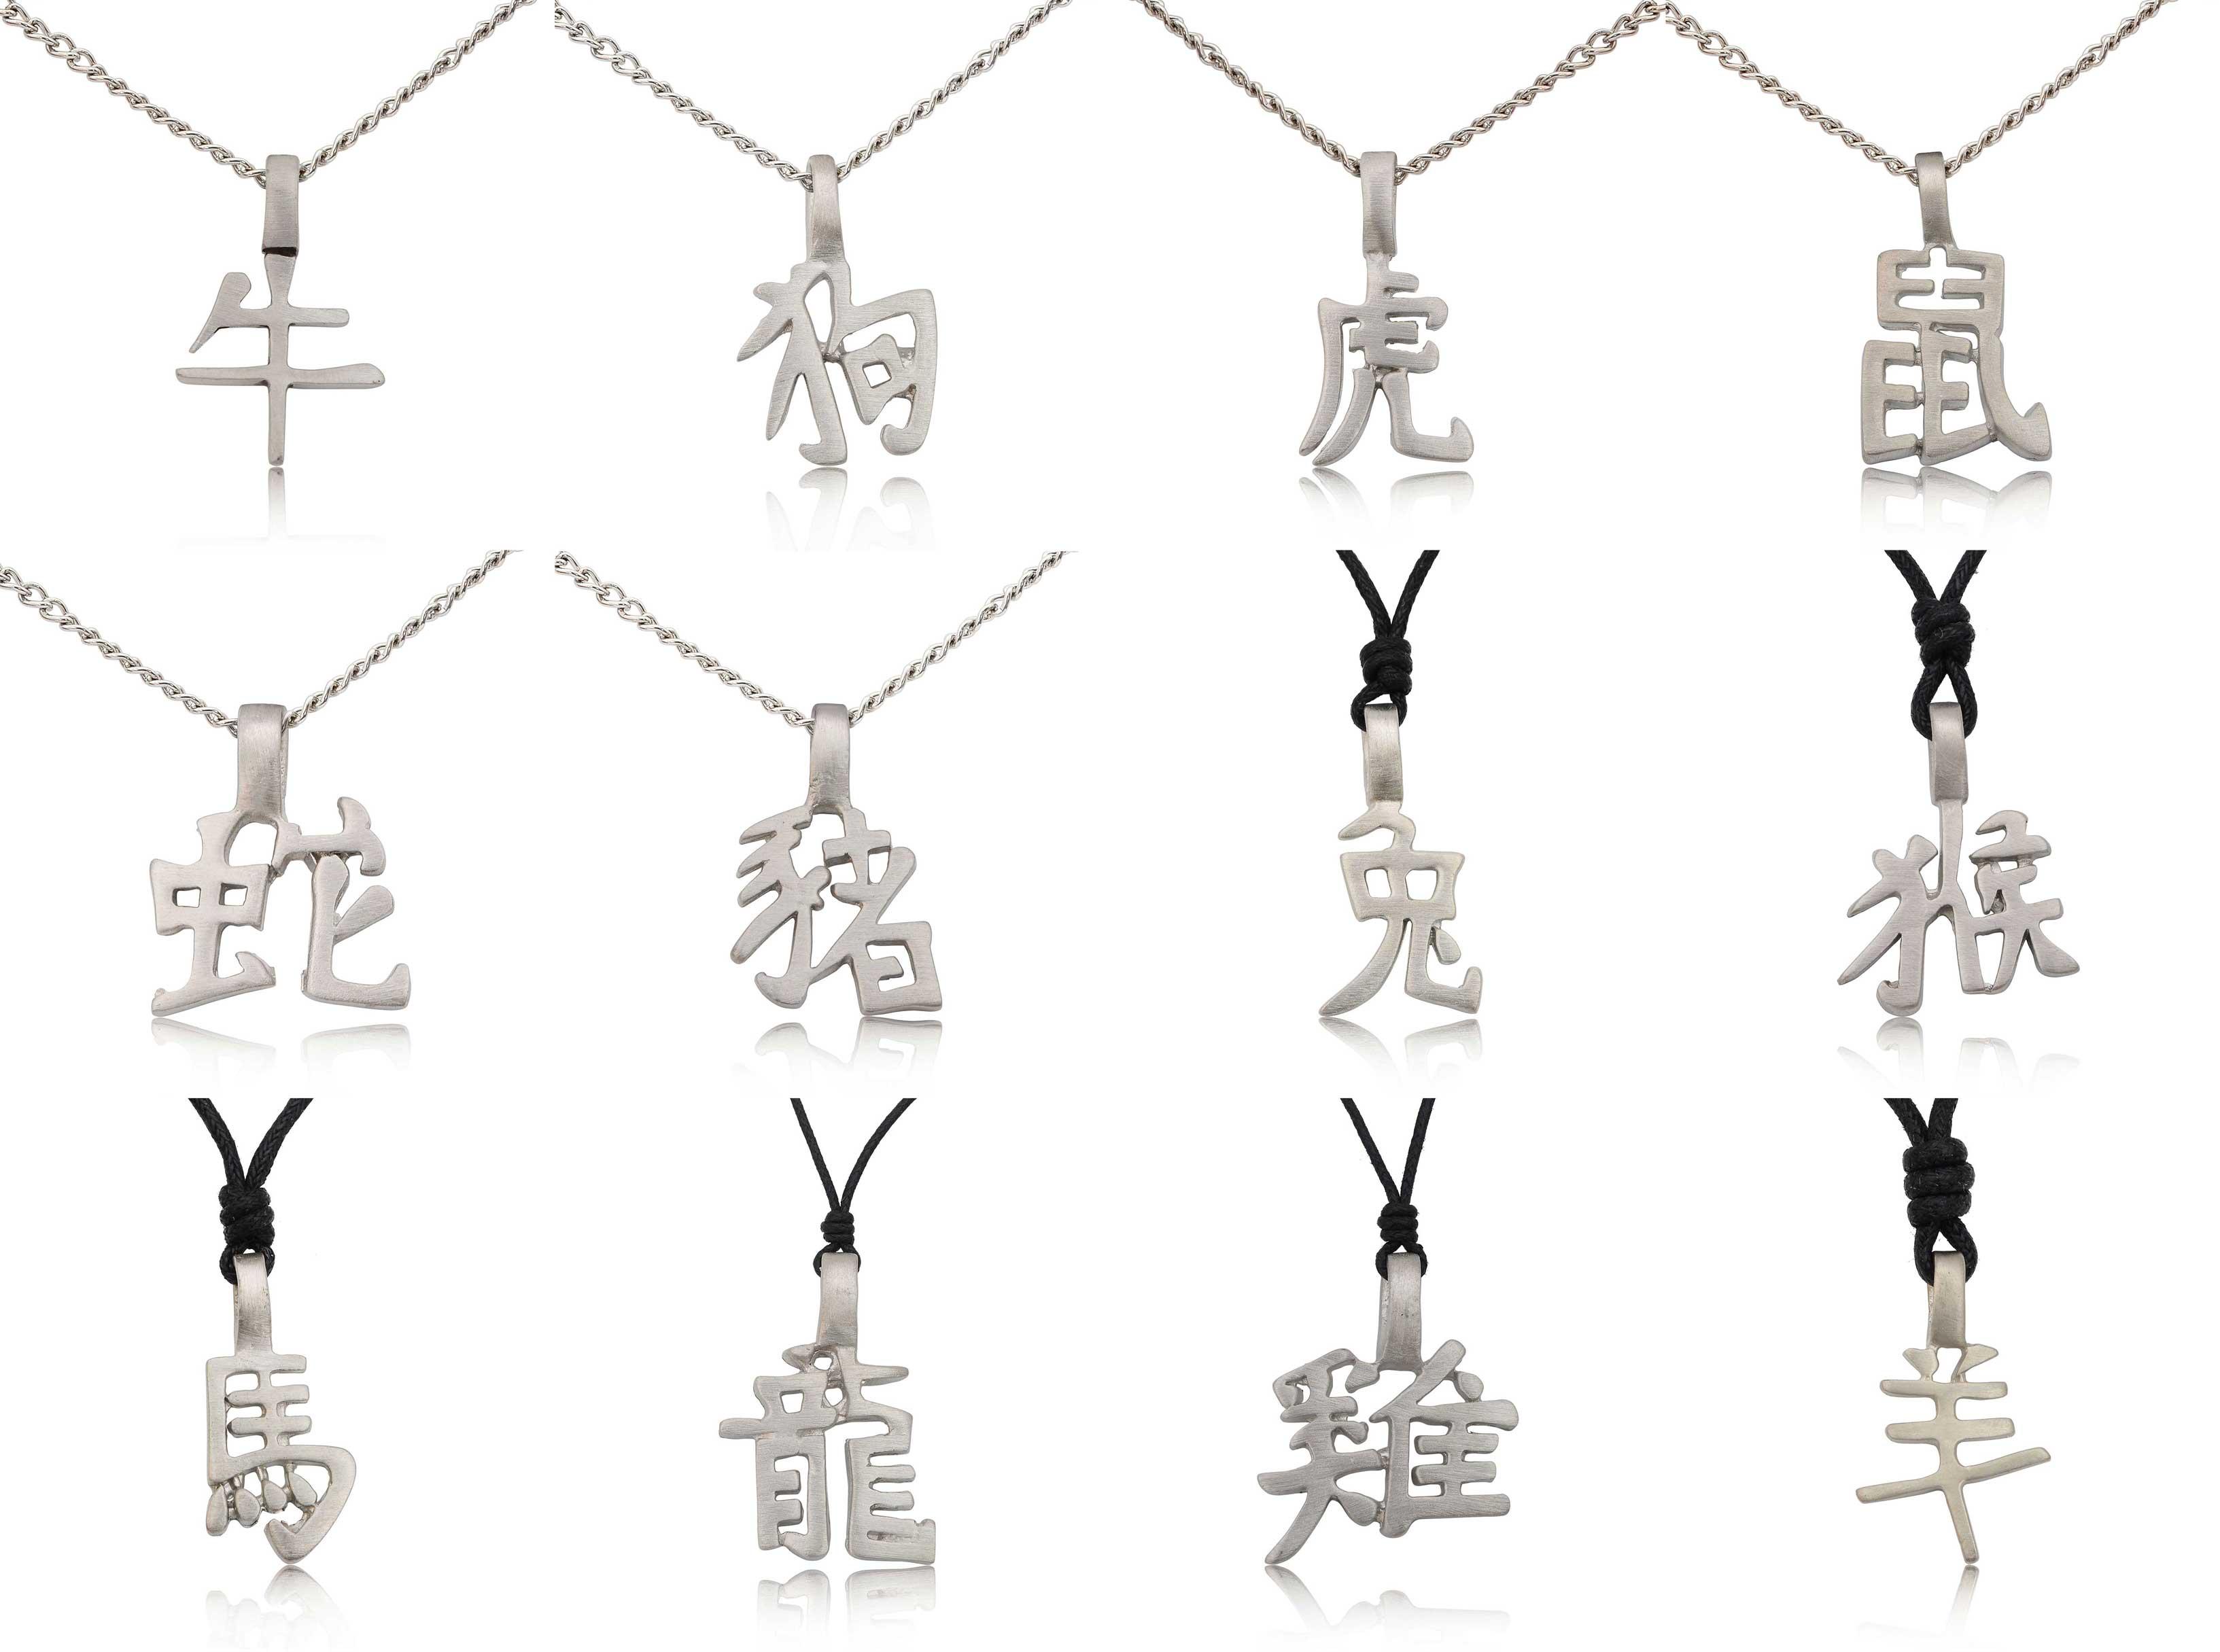 Zodiac chinese text silver pewter charm necklace pendant jewelry ebay image is loading zodiac chinese text silver pewter charm necklace pendant aloadofball Choice Image